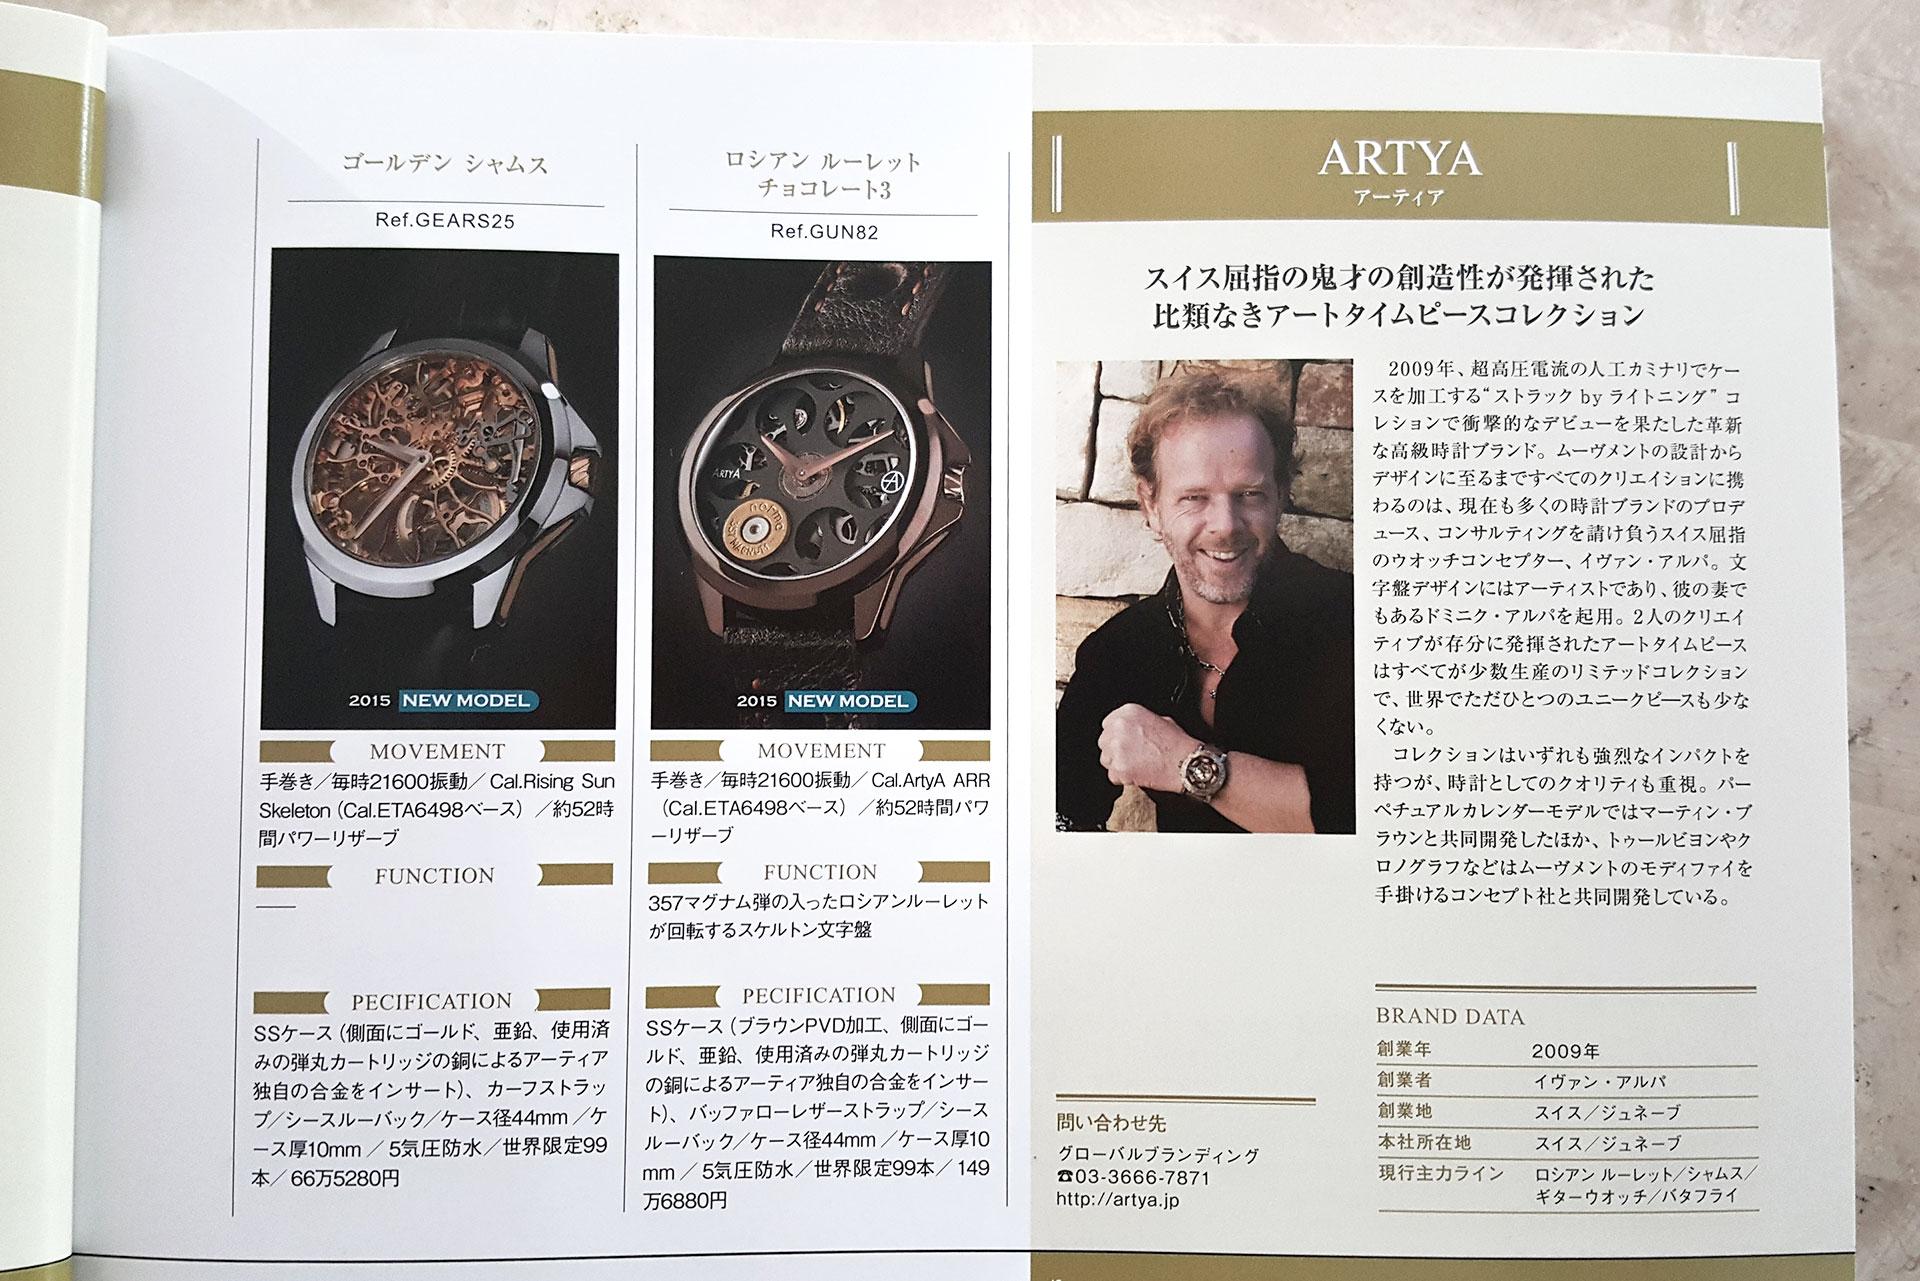 ArtyA 機械式腕時計年鑑2015-2016